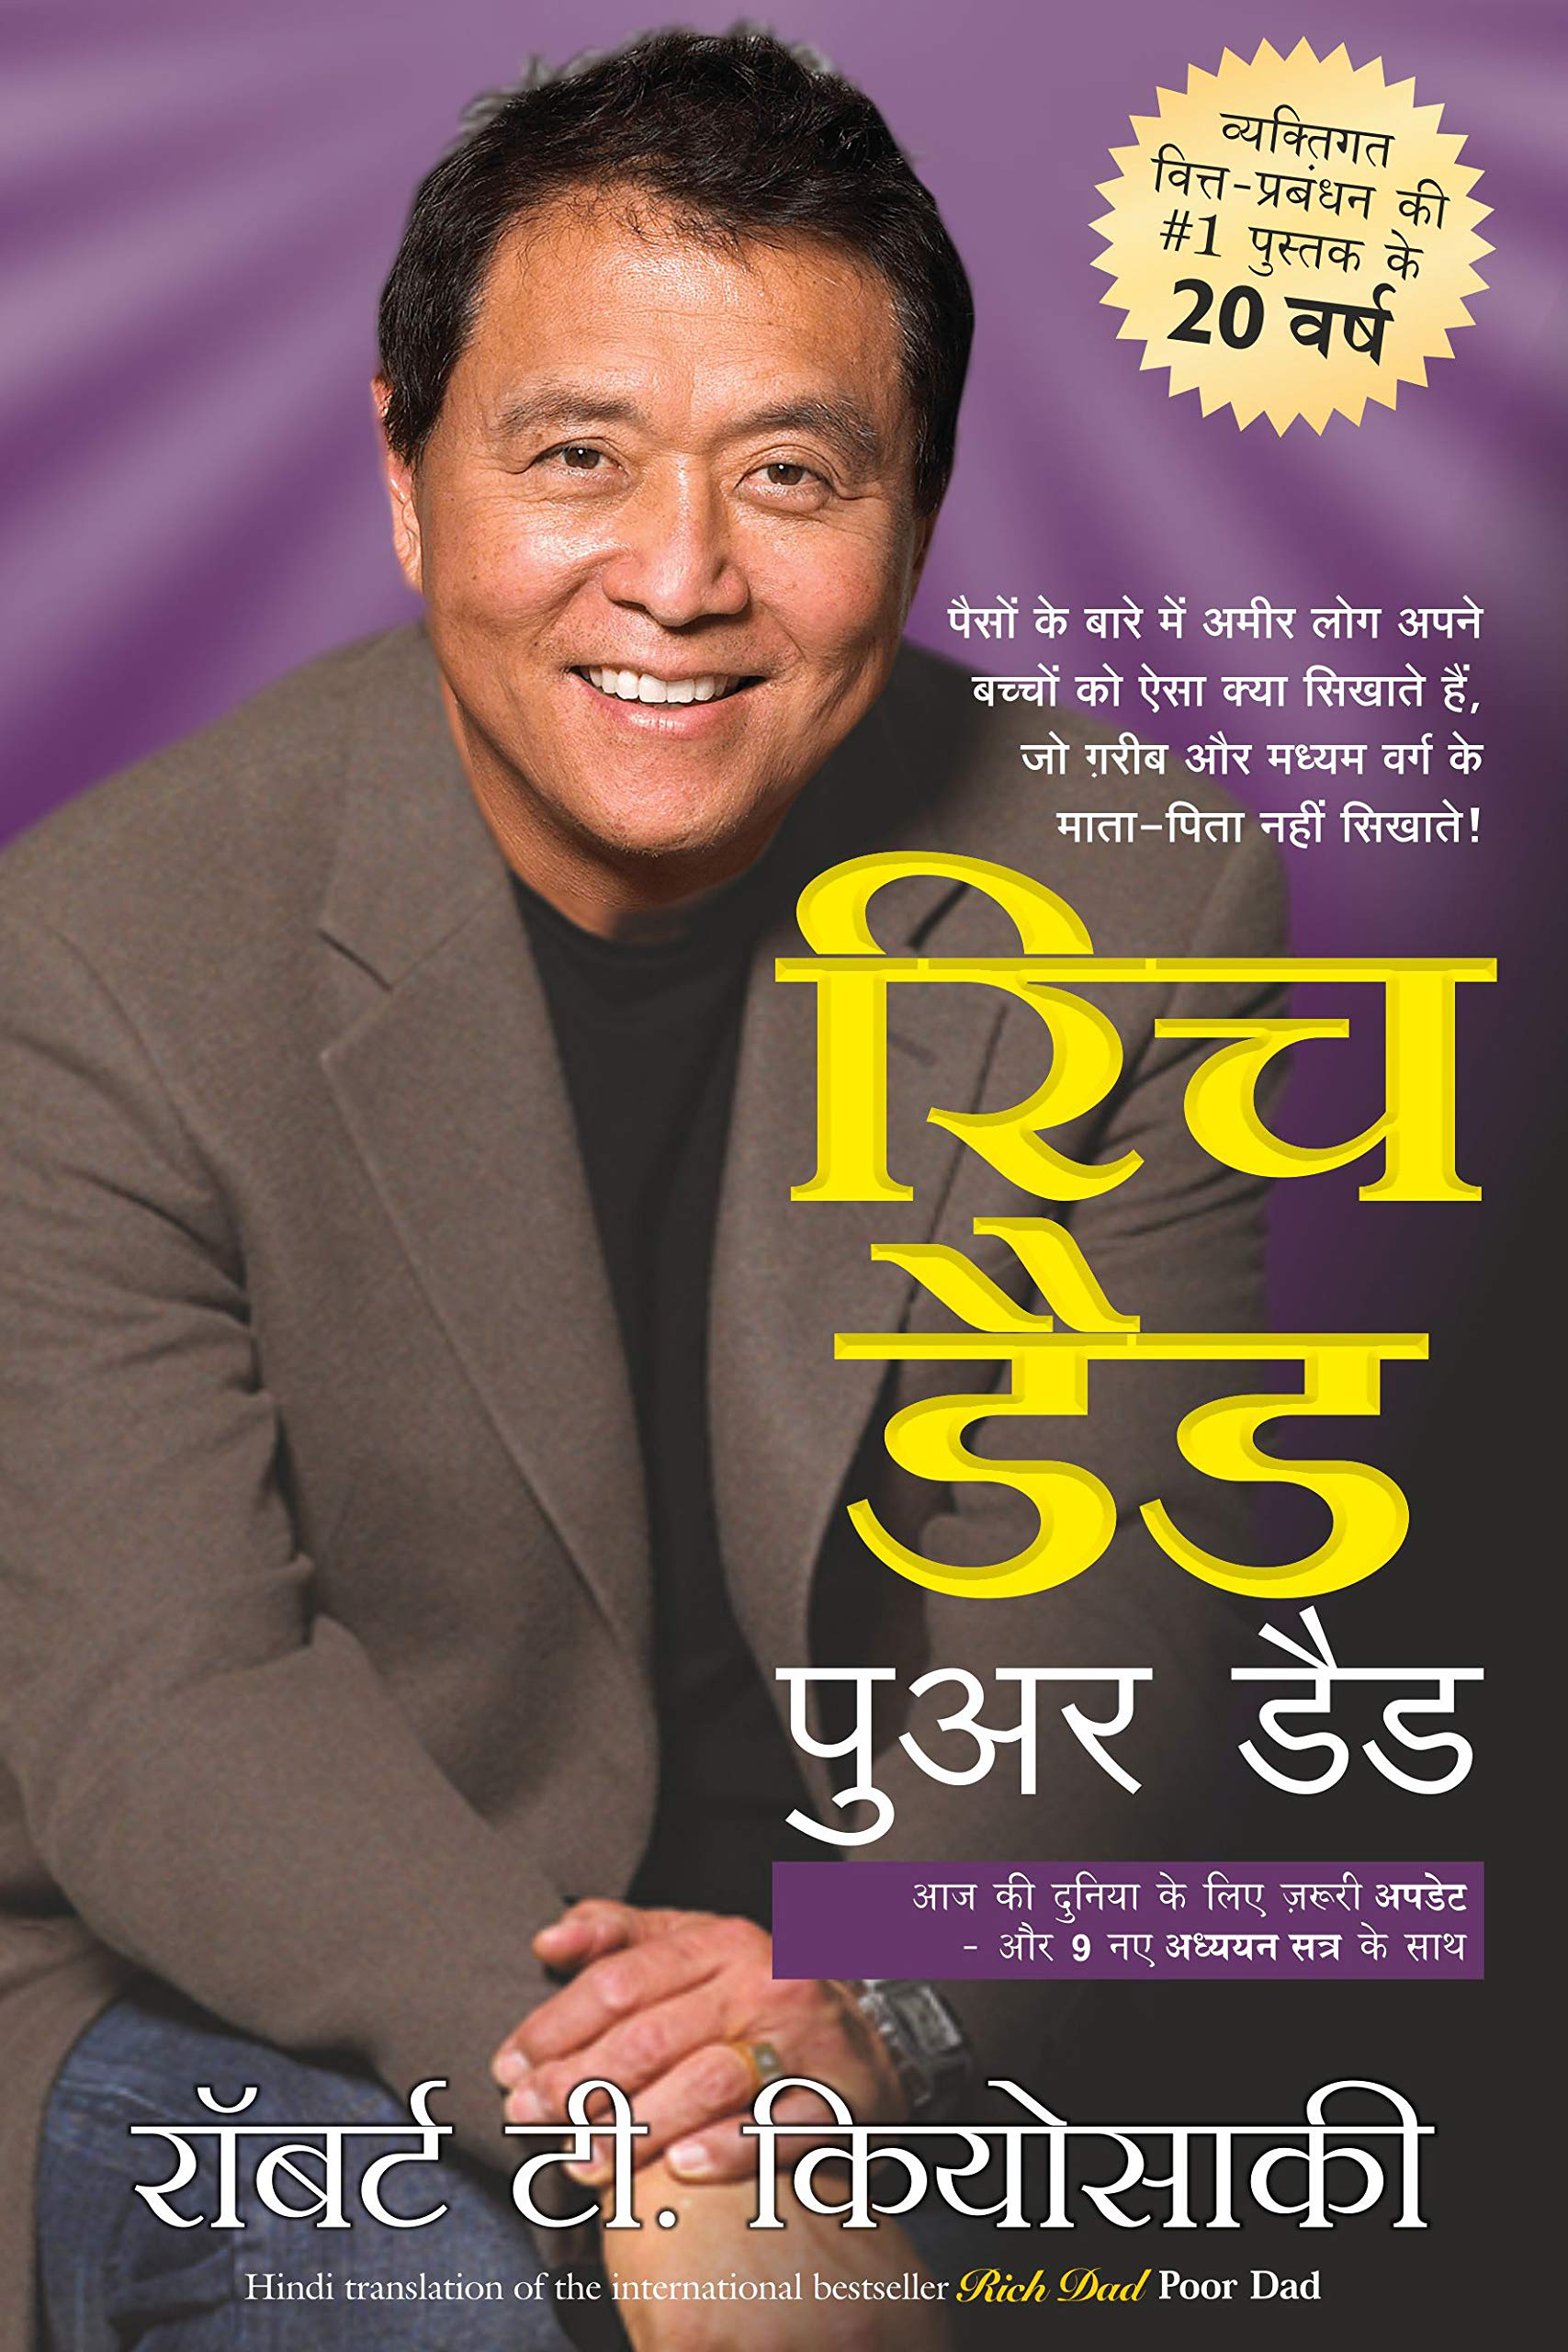 Rich Dad, Poor Dad- Motivational English and Hindi Story Book